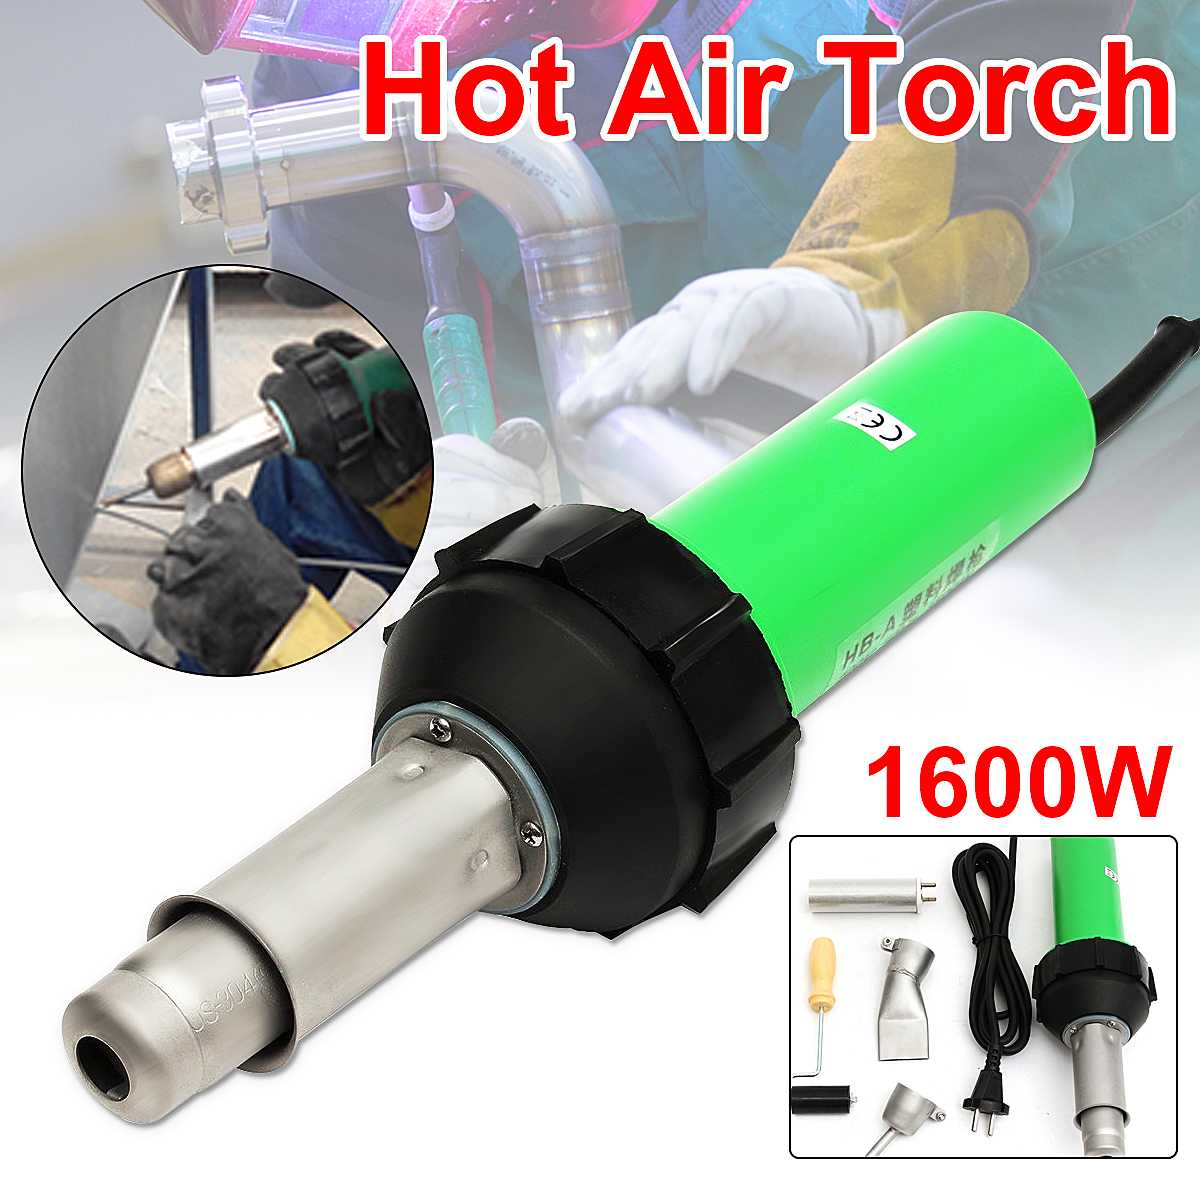 1600W Professional Electronic Heat Hot Air Torch Plastic Heat Guns Pistol + Nozzle + Pressure Roller